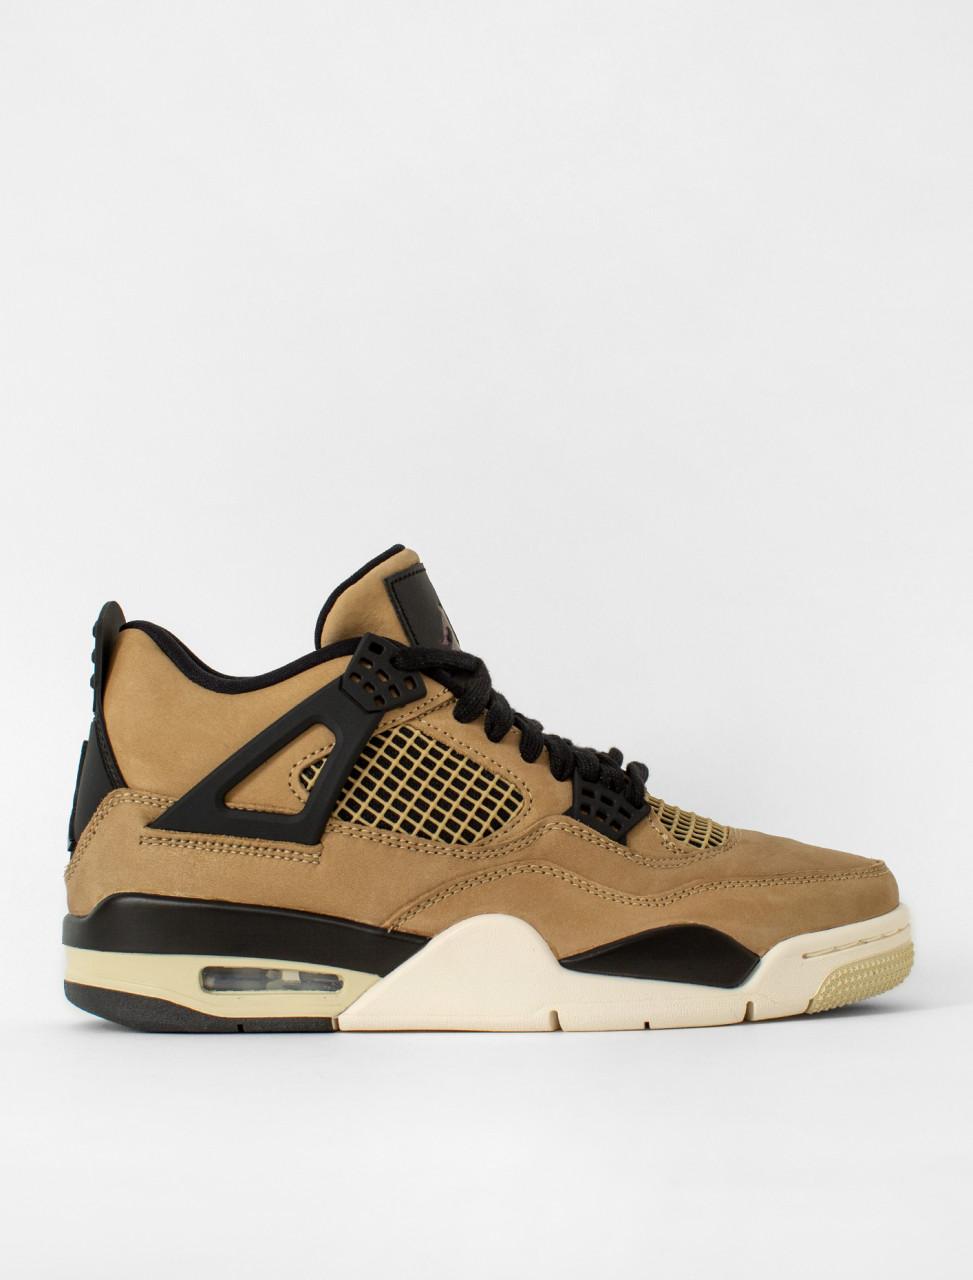 W Air Jordan 4 Retro Sneaker